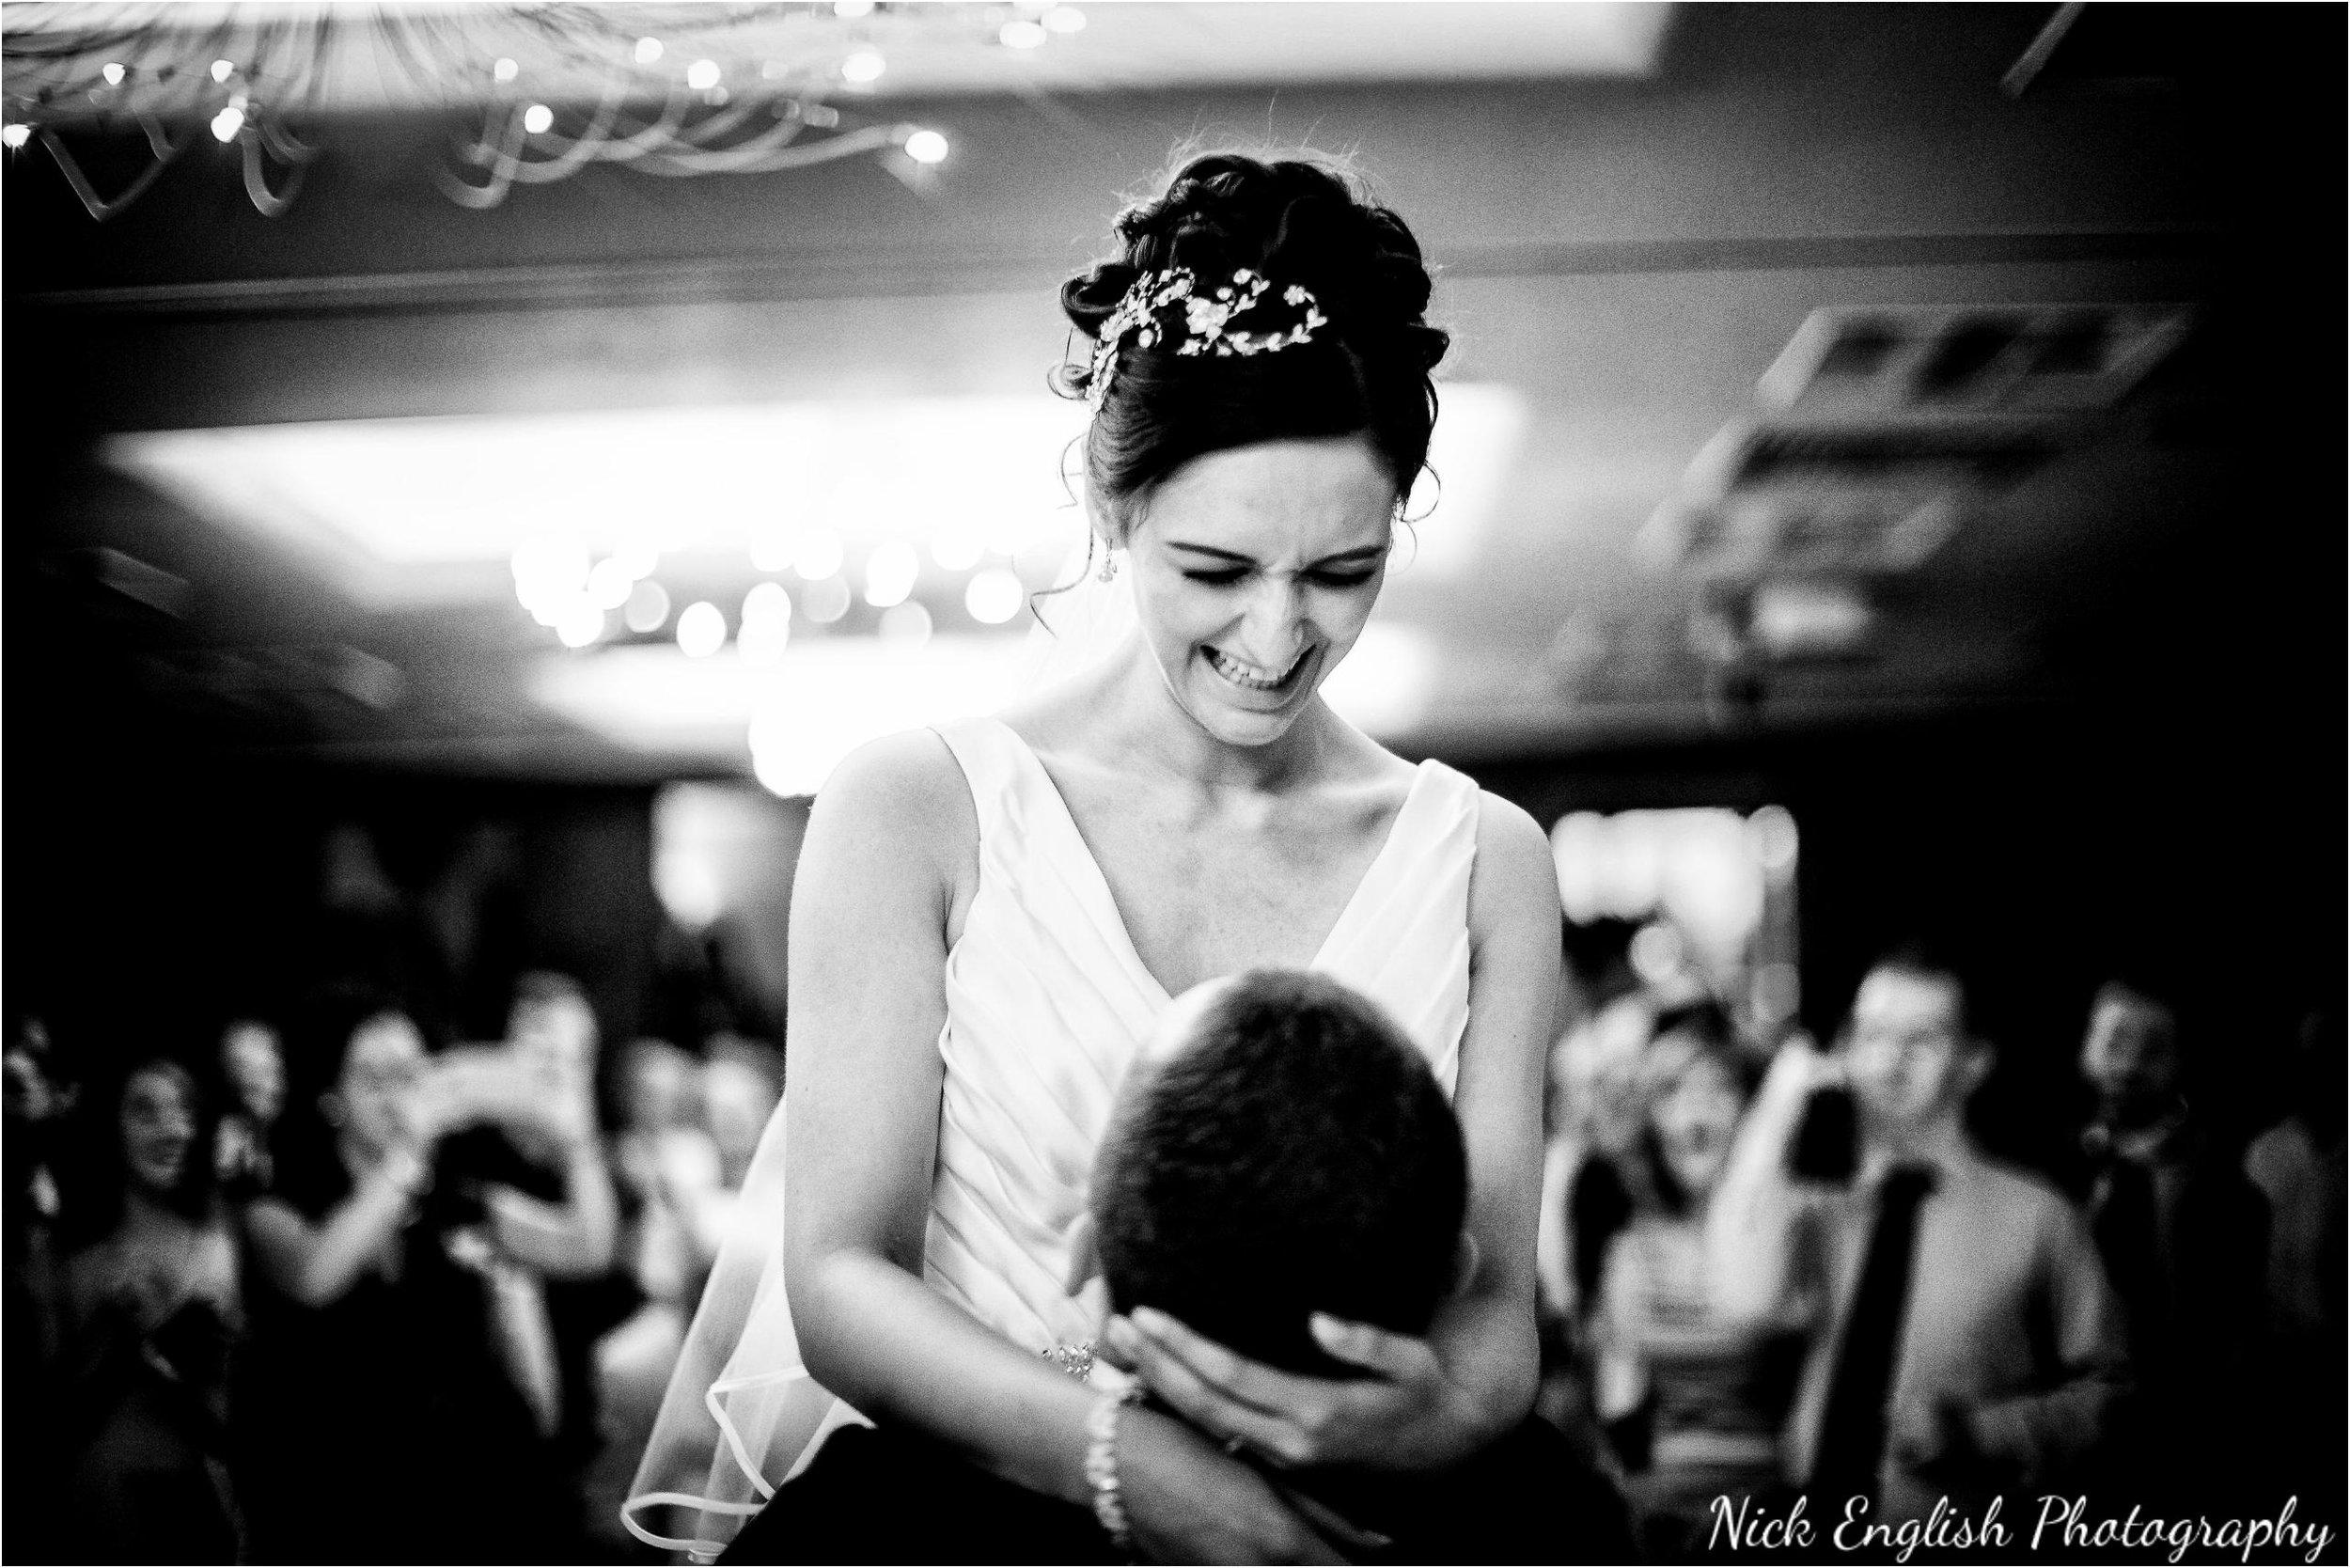 Emily David Wedding Photographs at Barton Grange Preston by Nick English Photography 224jpg.jpeg